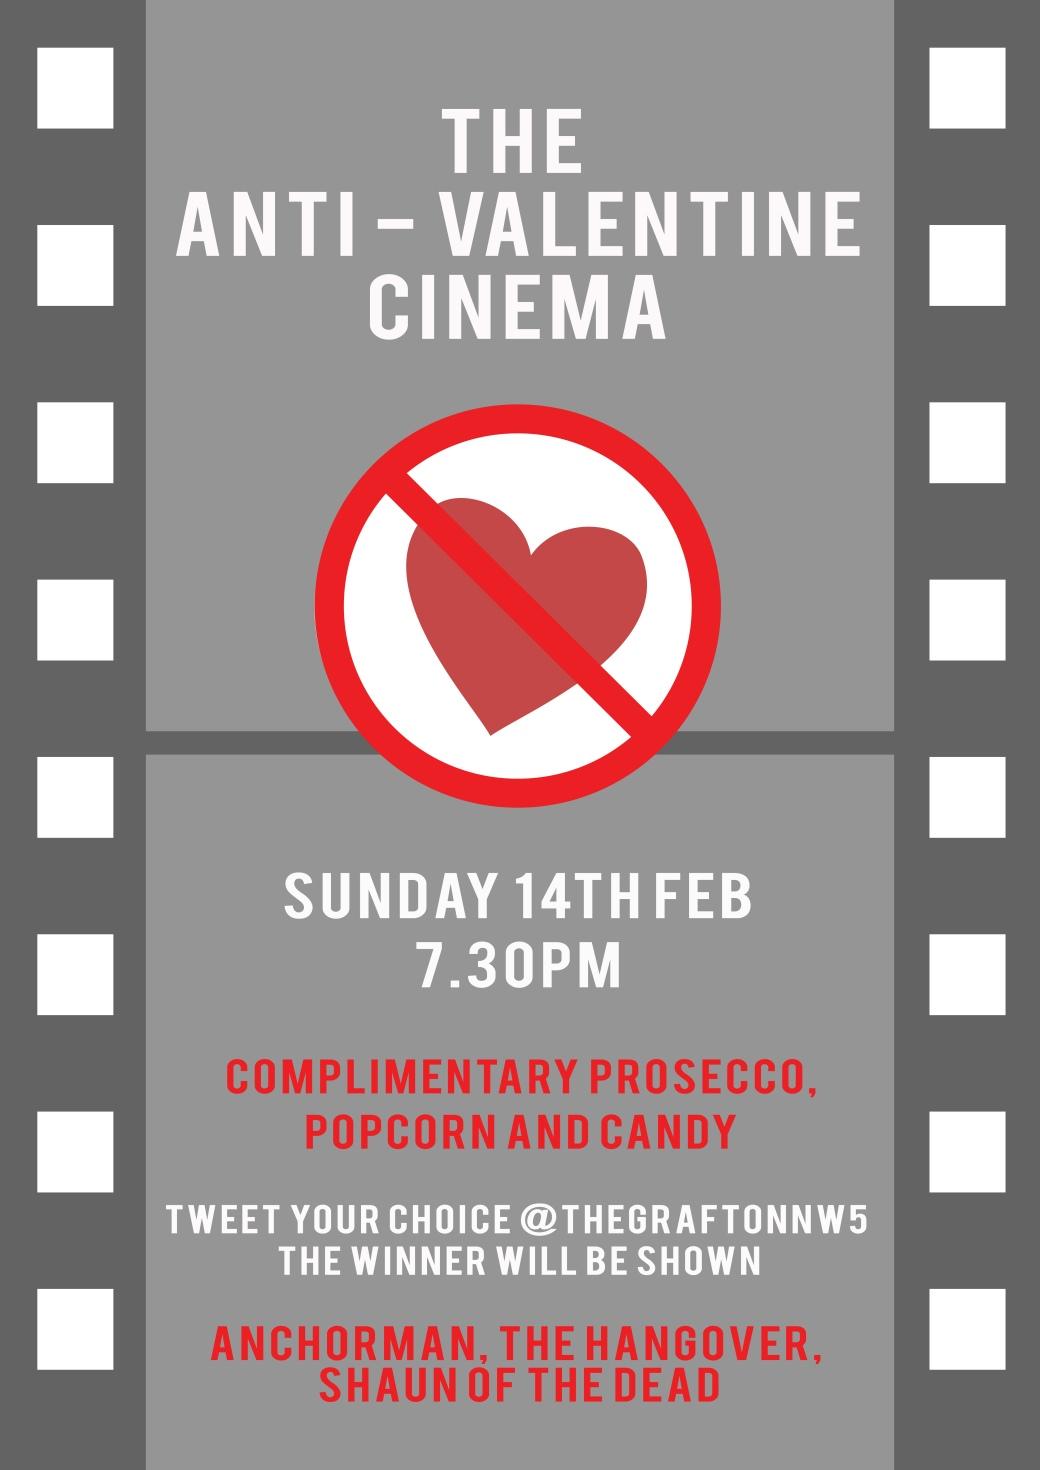 Anti - Valentines